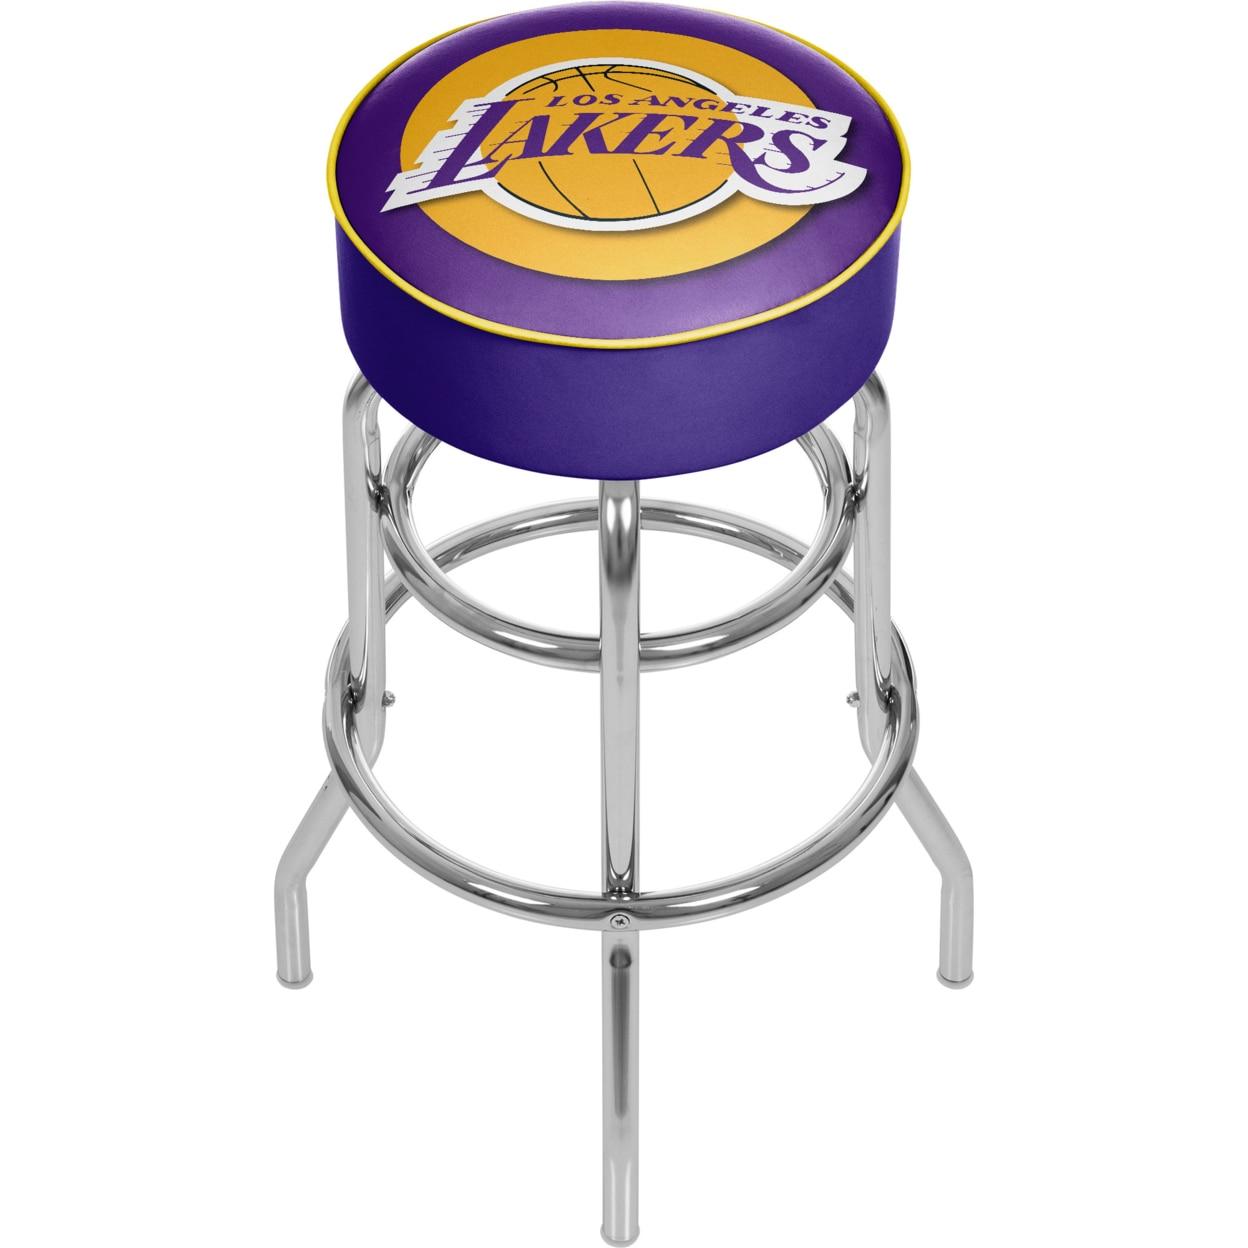 Los Angeles Lakers NBA Padded Swivel Bar Stool 30 Inches High баскетбольную форму lakers